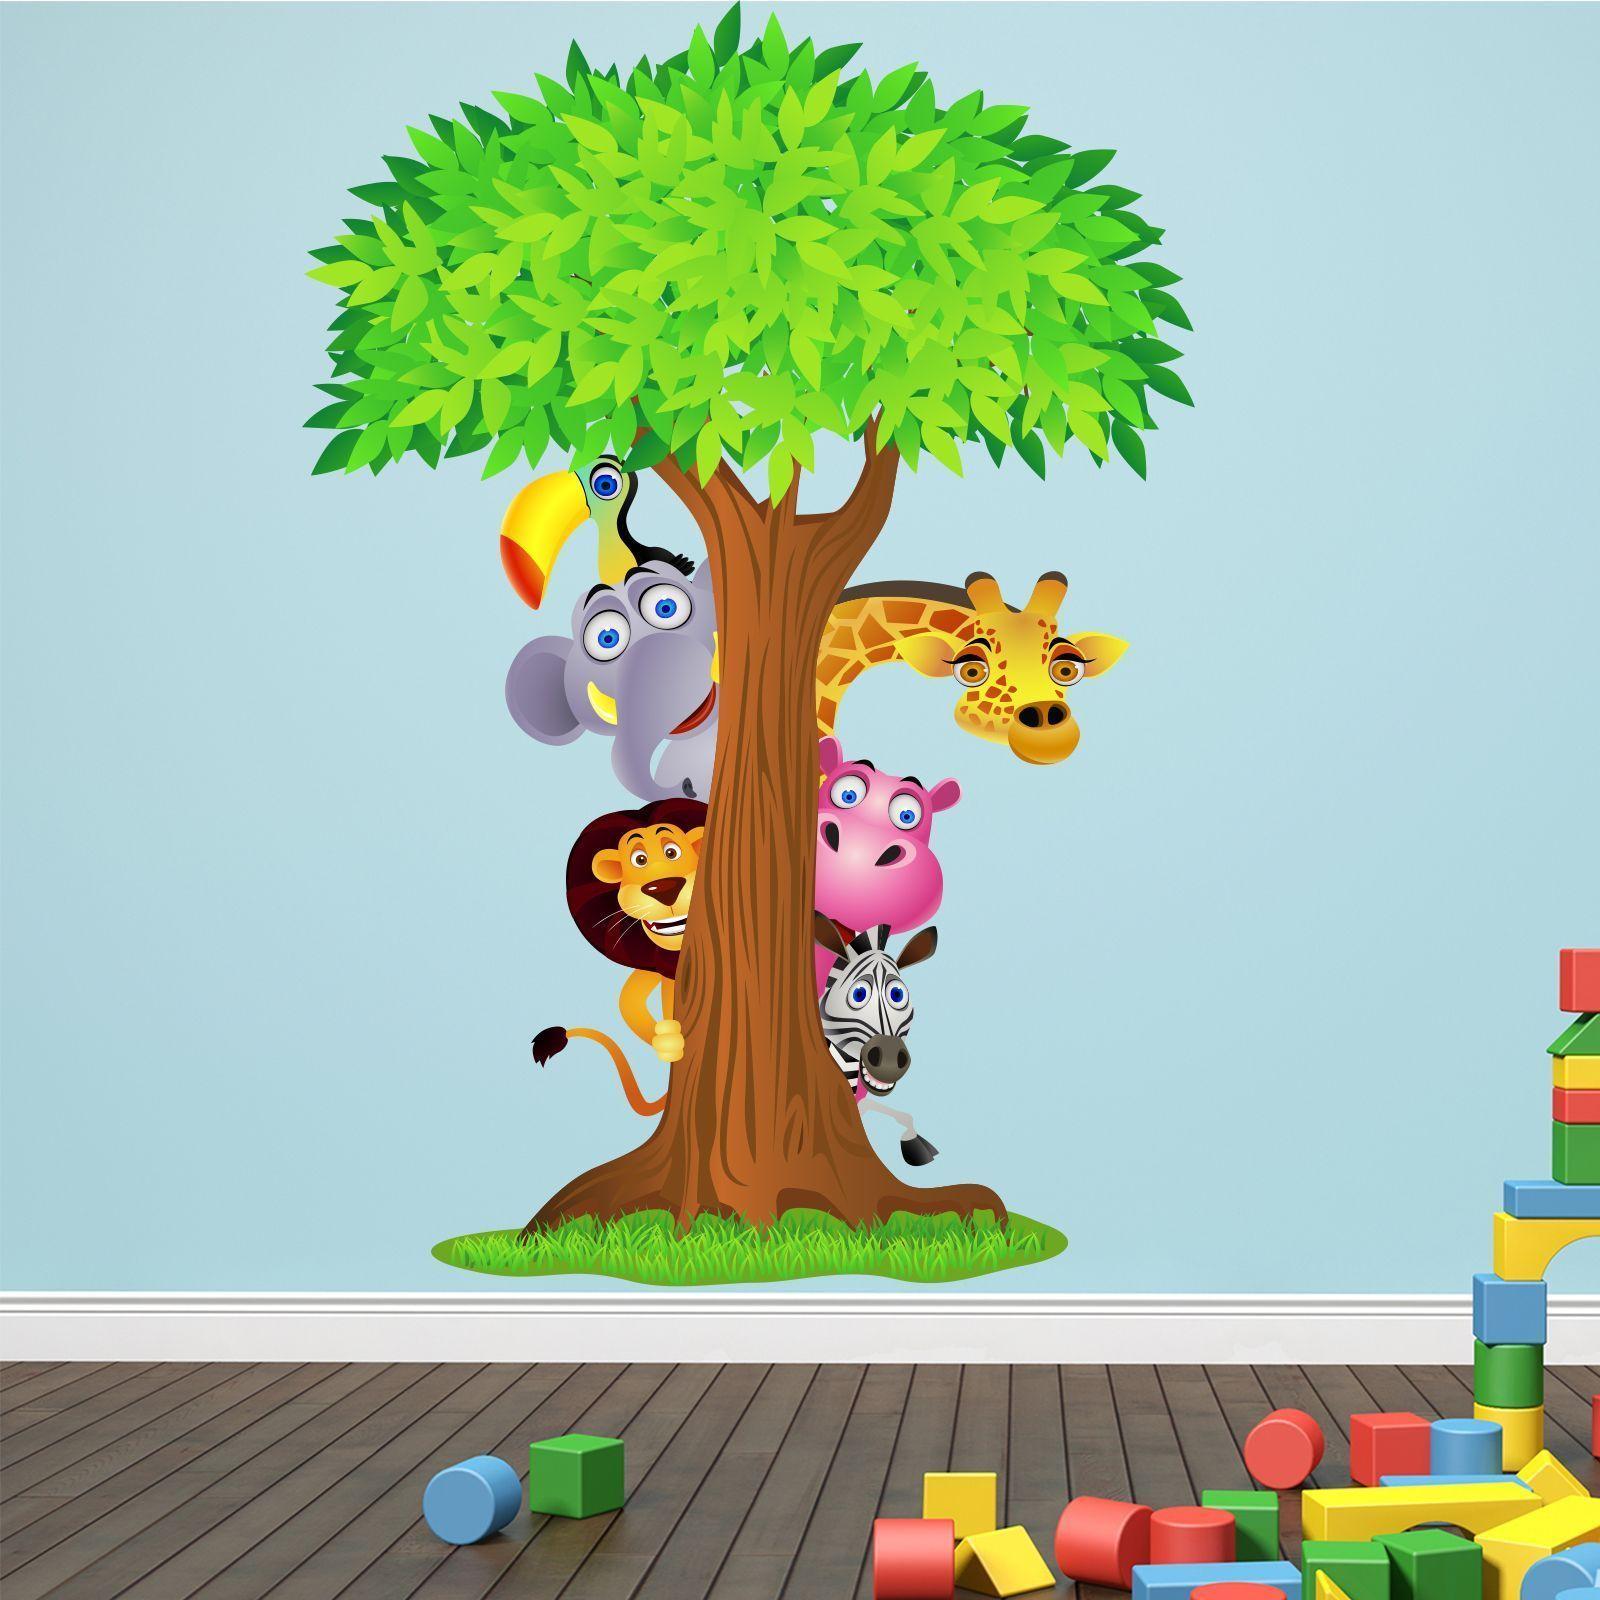 Wandtattoo Dschungel Tiere Baum 115x165cm Comic Kinder